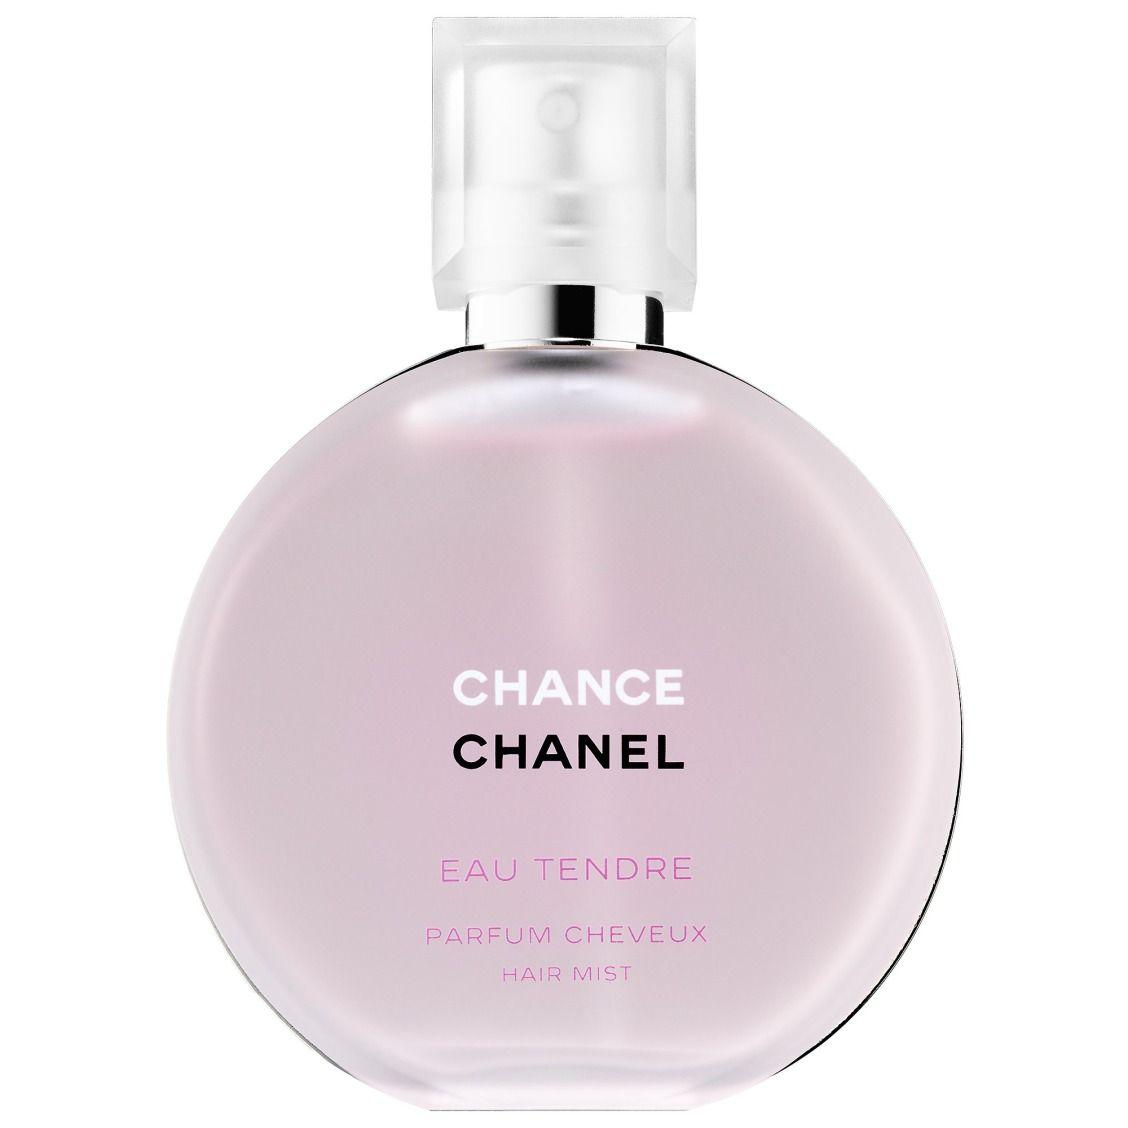 Chance Eau Tendre Hair Mist Hair Mist Fragrance Perfume